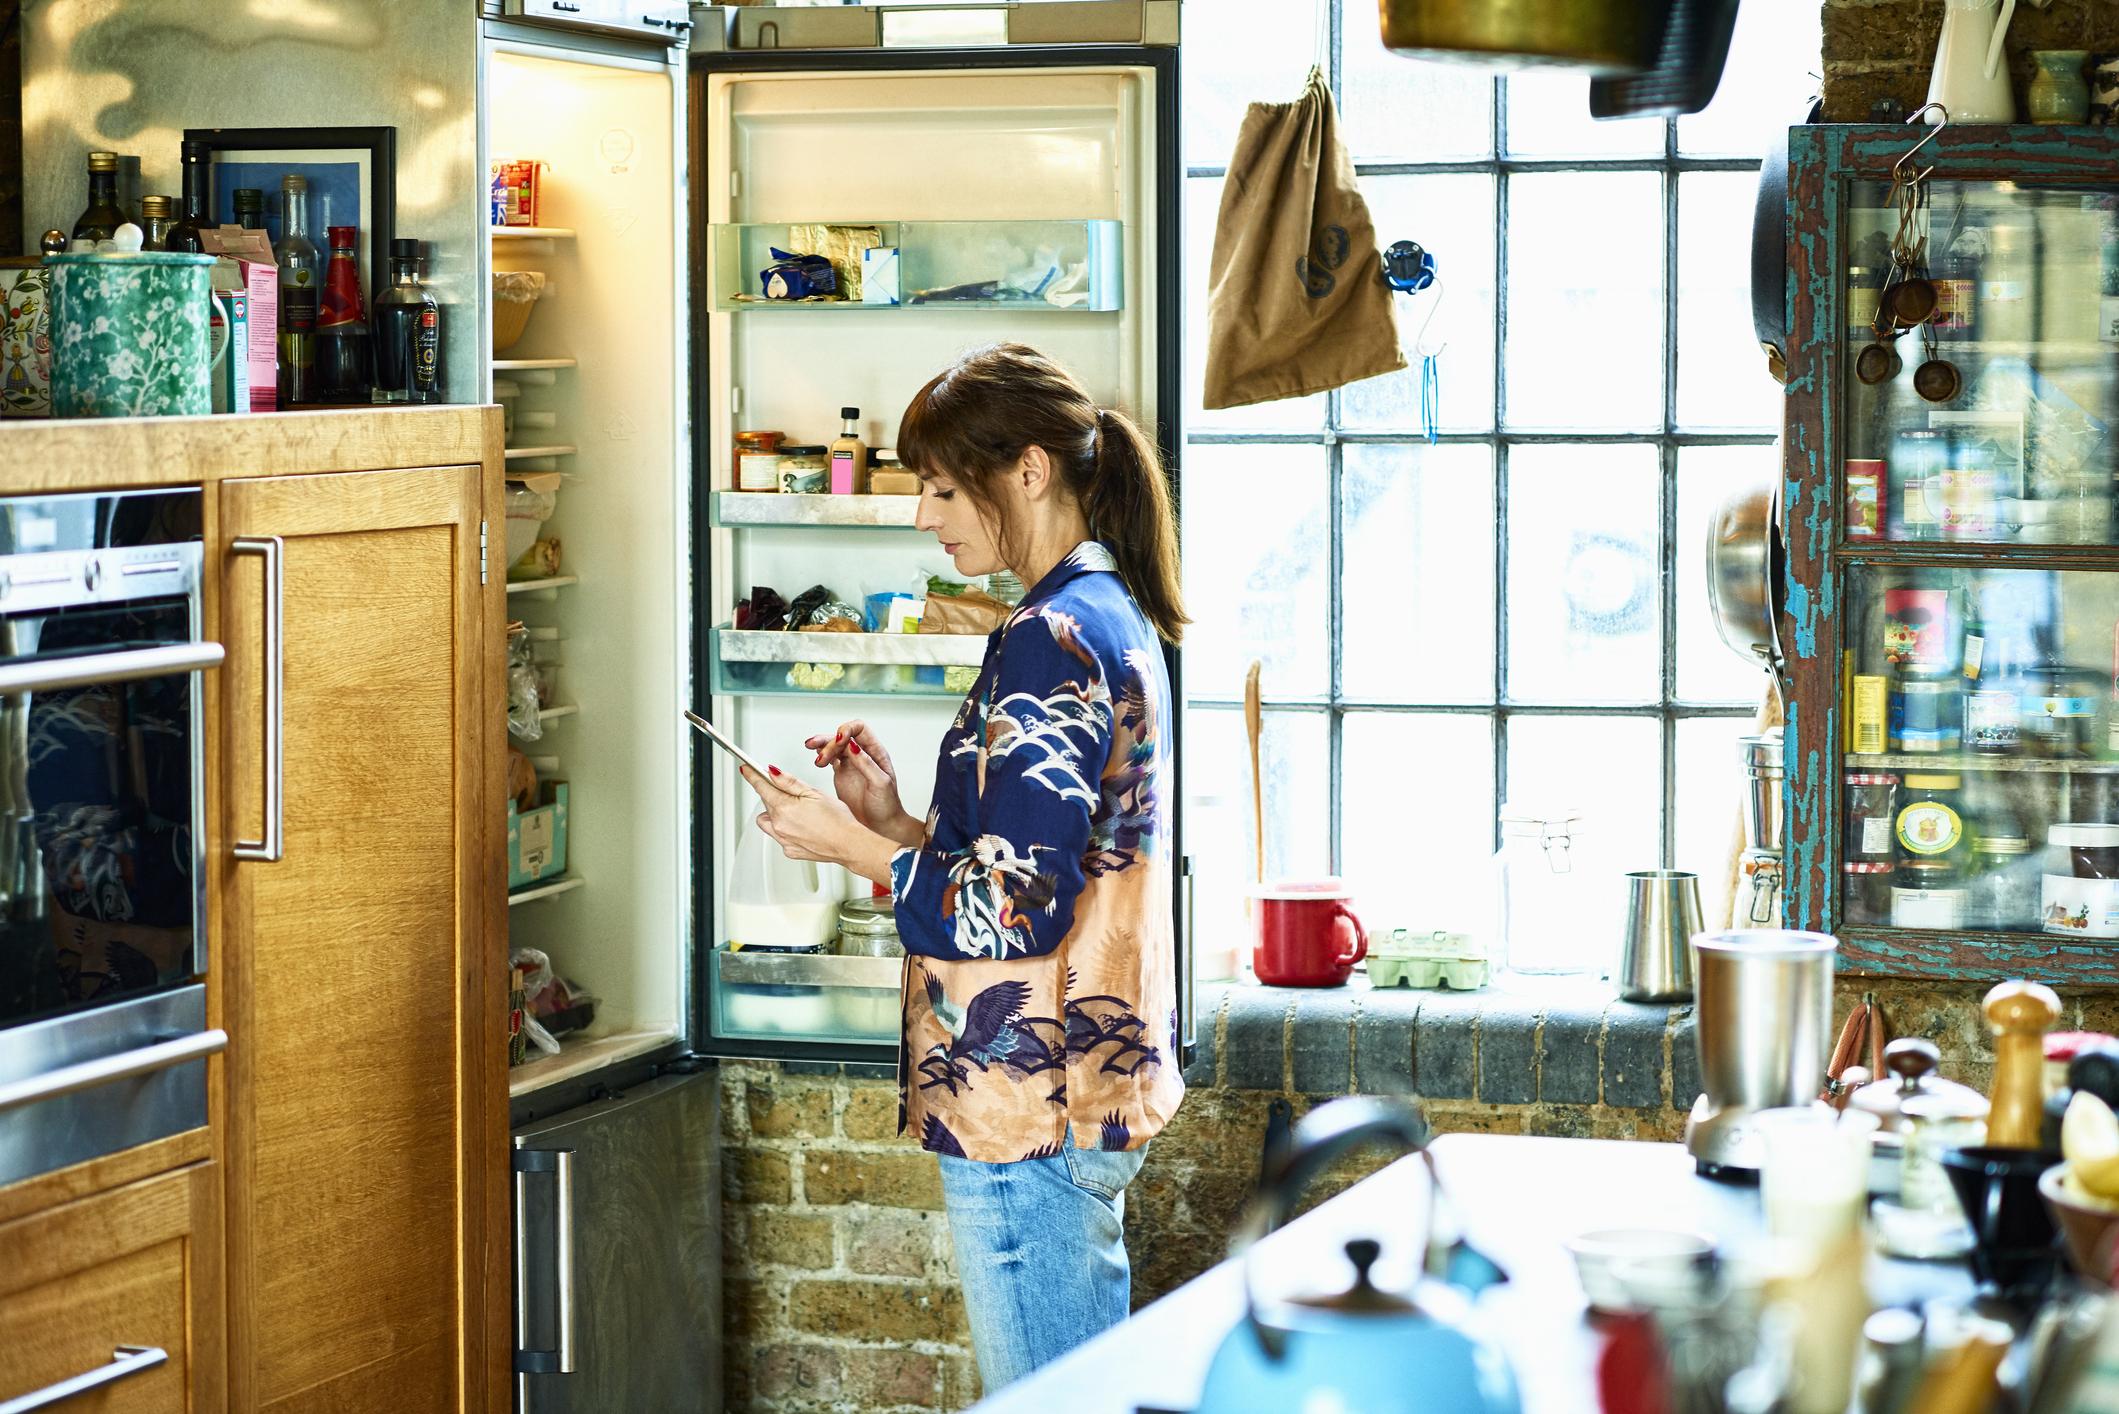 refrigerator facts